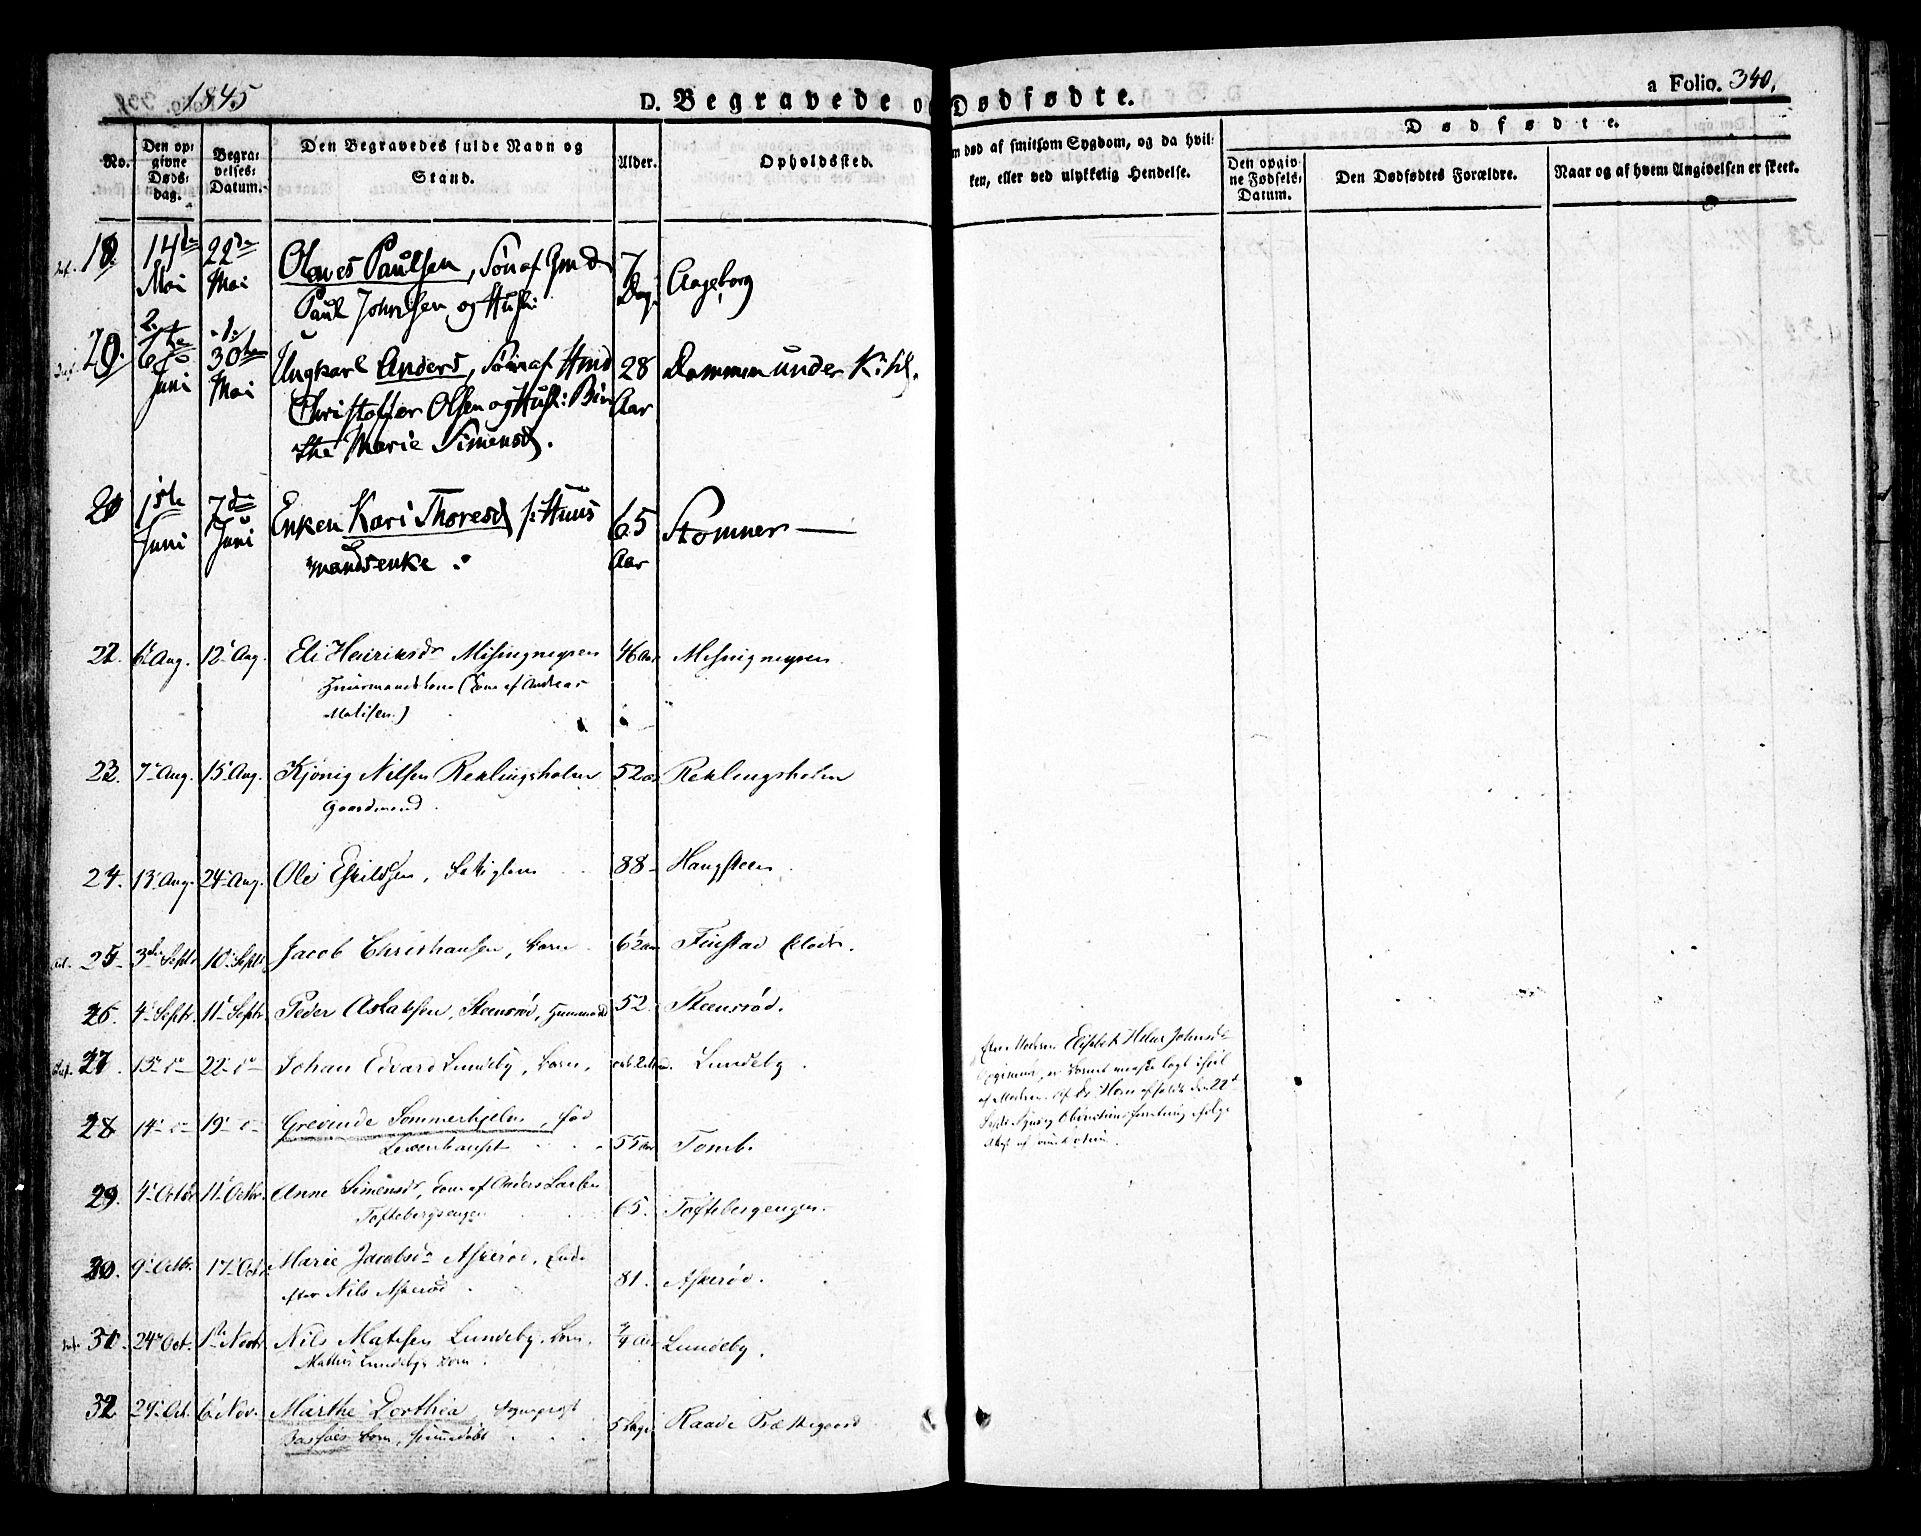 SAO, Råde prestekontor kirkebøker, F/Fa/L0005: Ministerialbok nr. 5, 1830-1853, s. 340